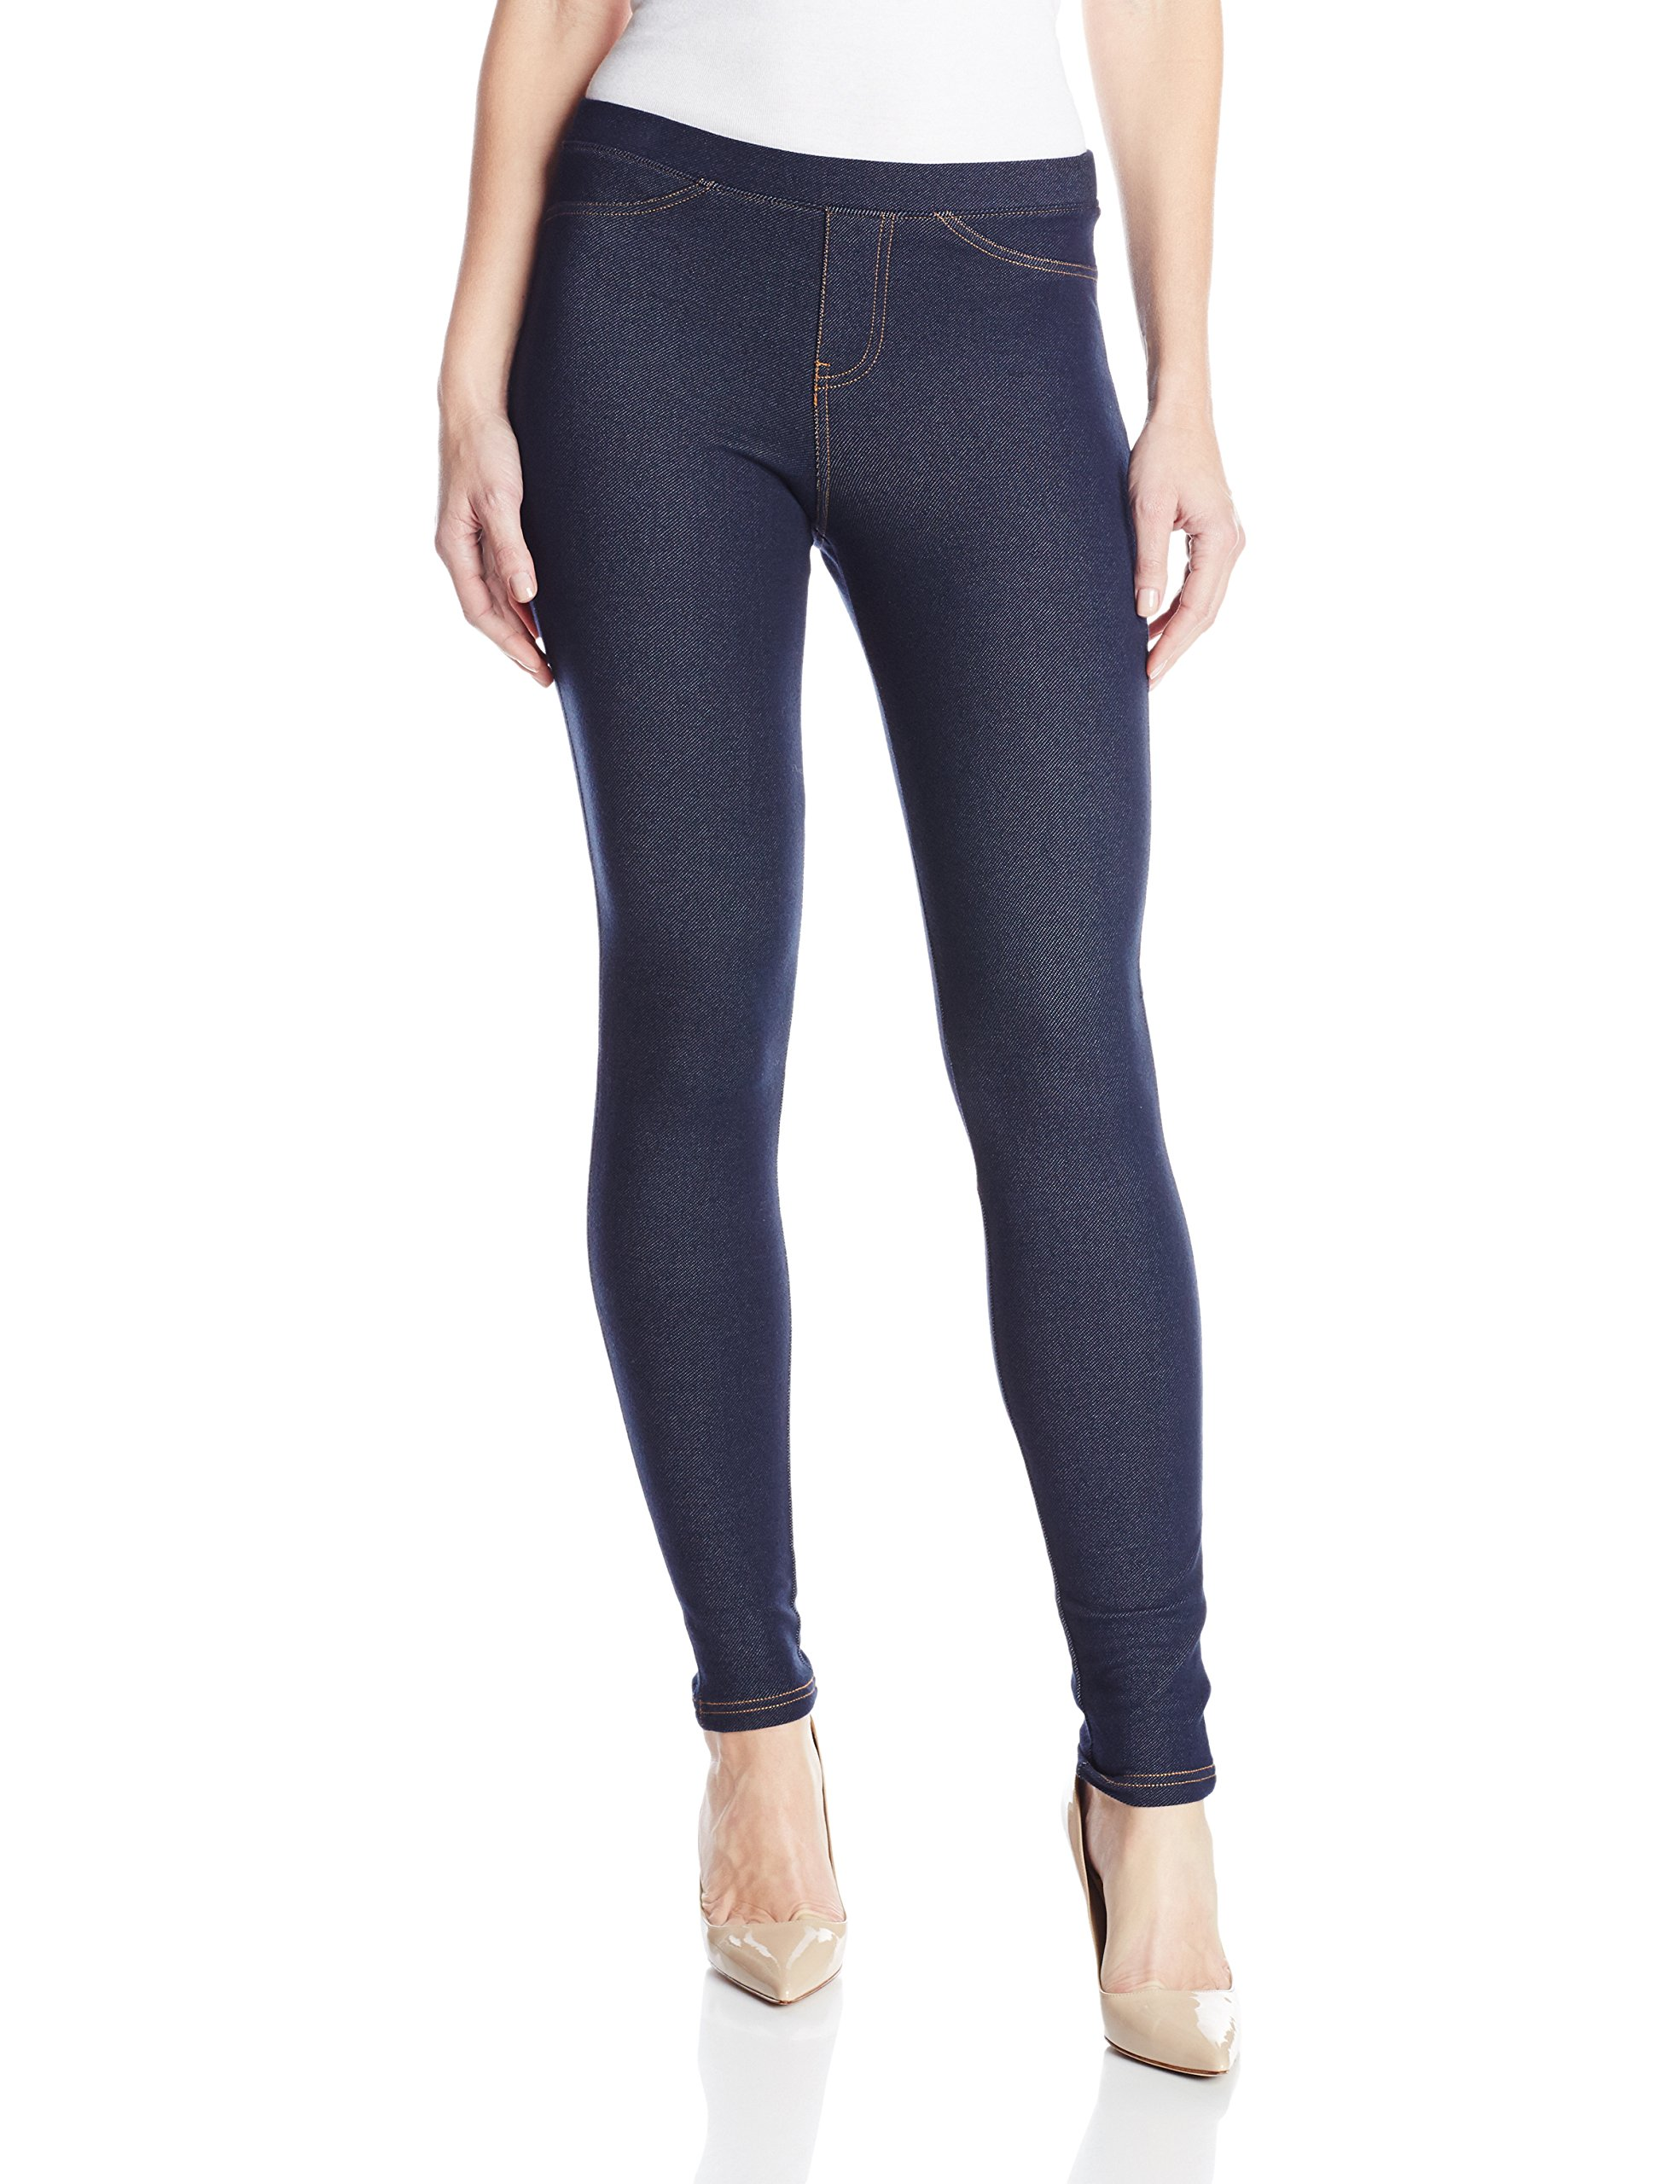 a276f3b2db6 Best Rated in Women s Leggings   Helpful Customer Reviews - Amazon.ca